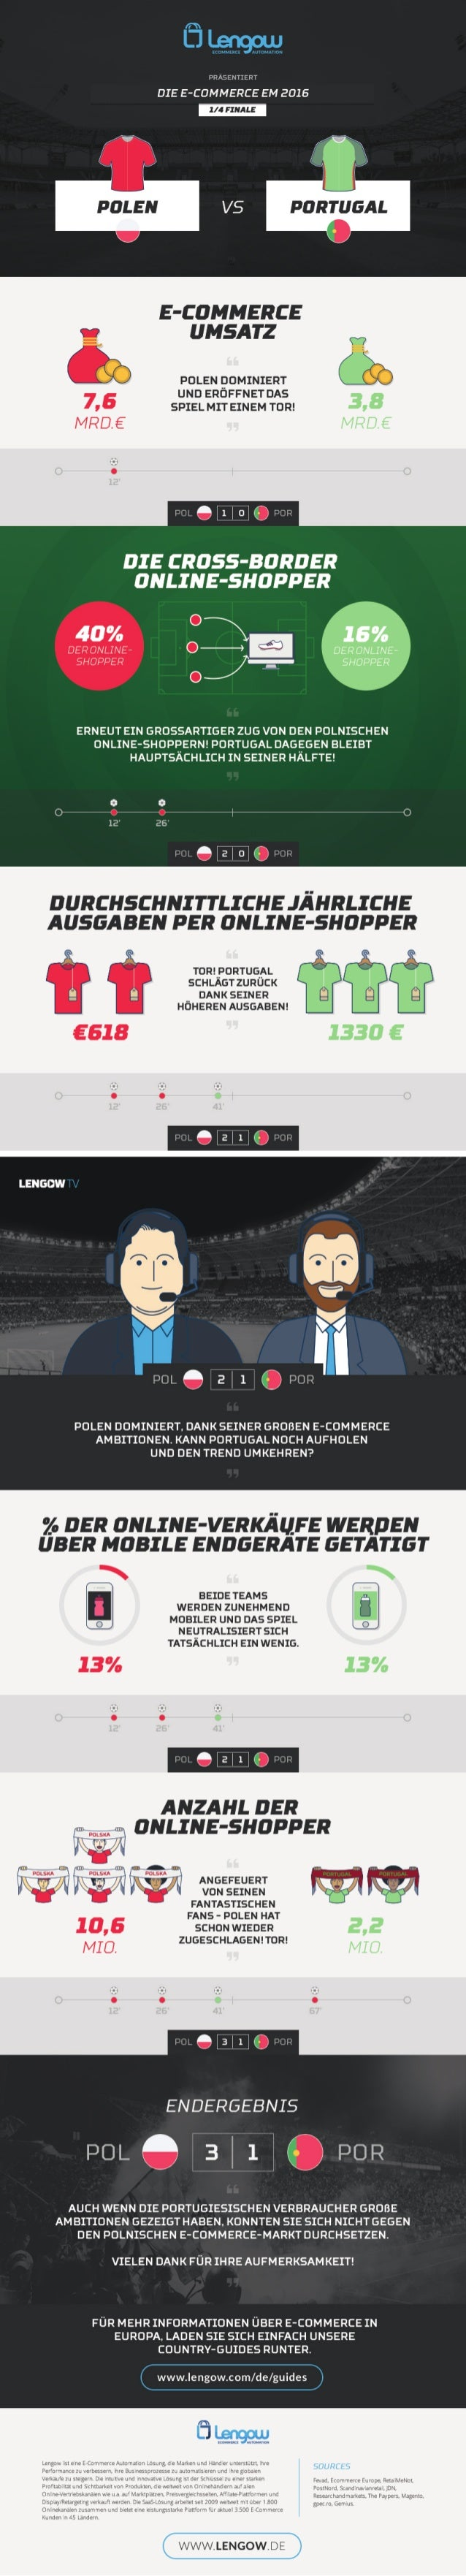 Die E-Commerce EM: Polen - Portugal